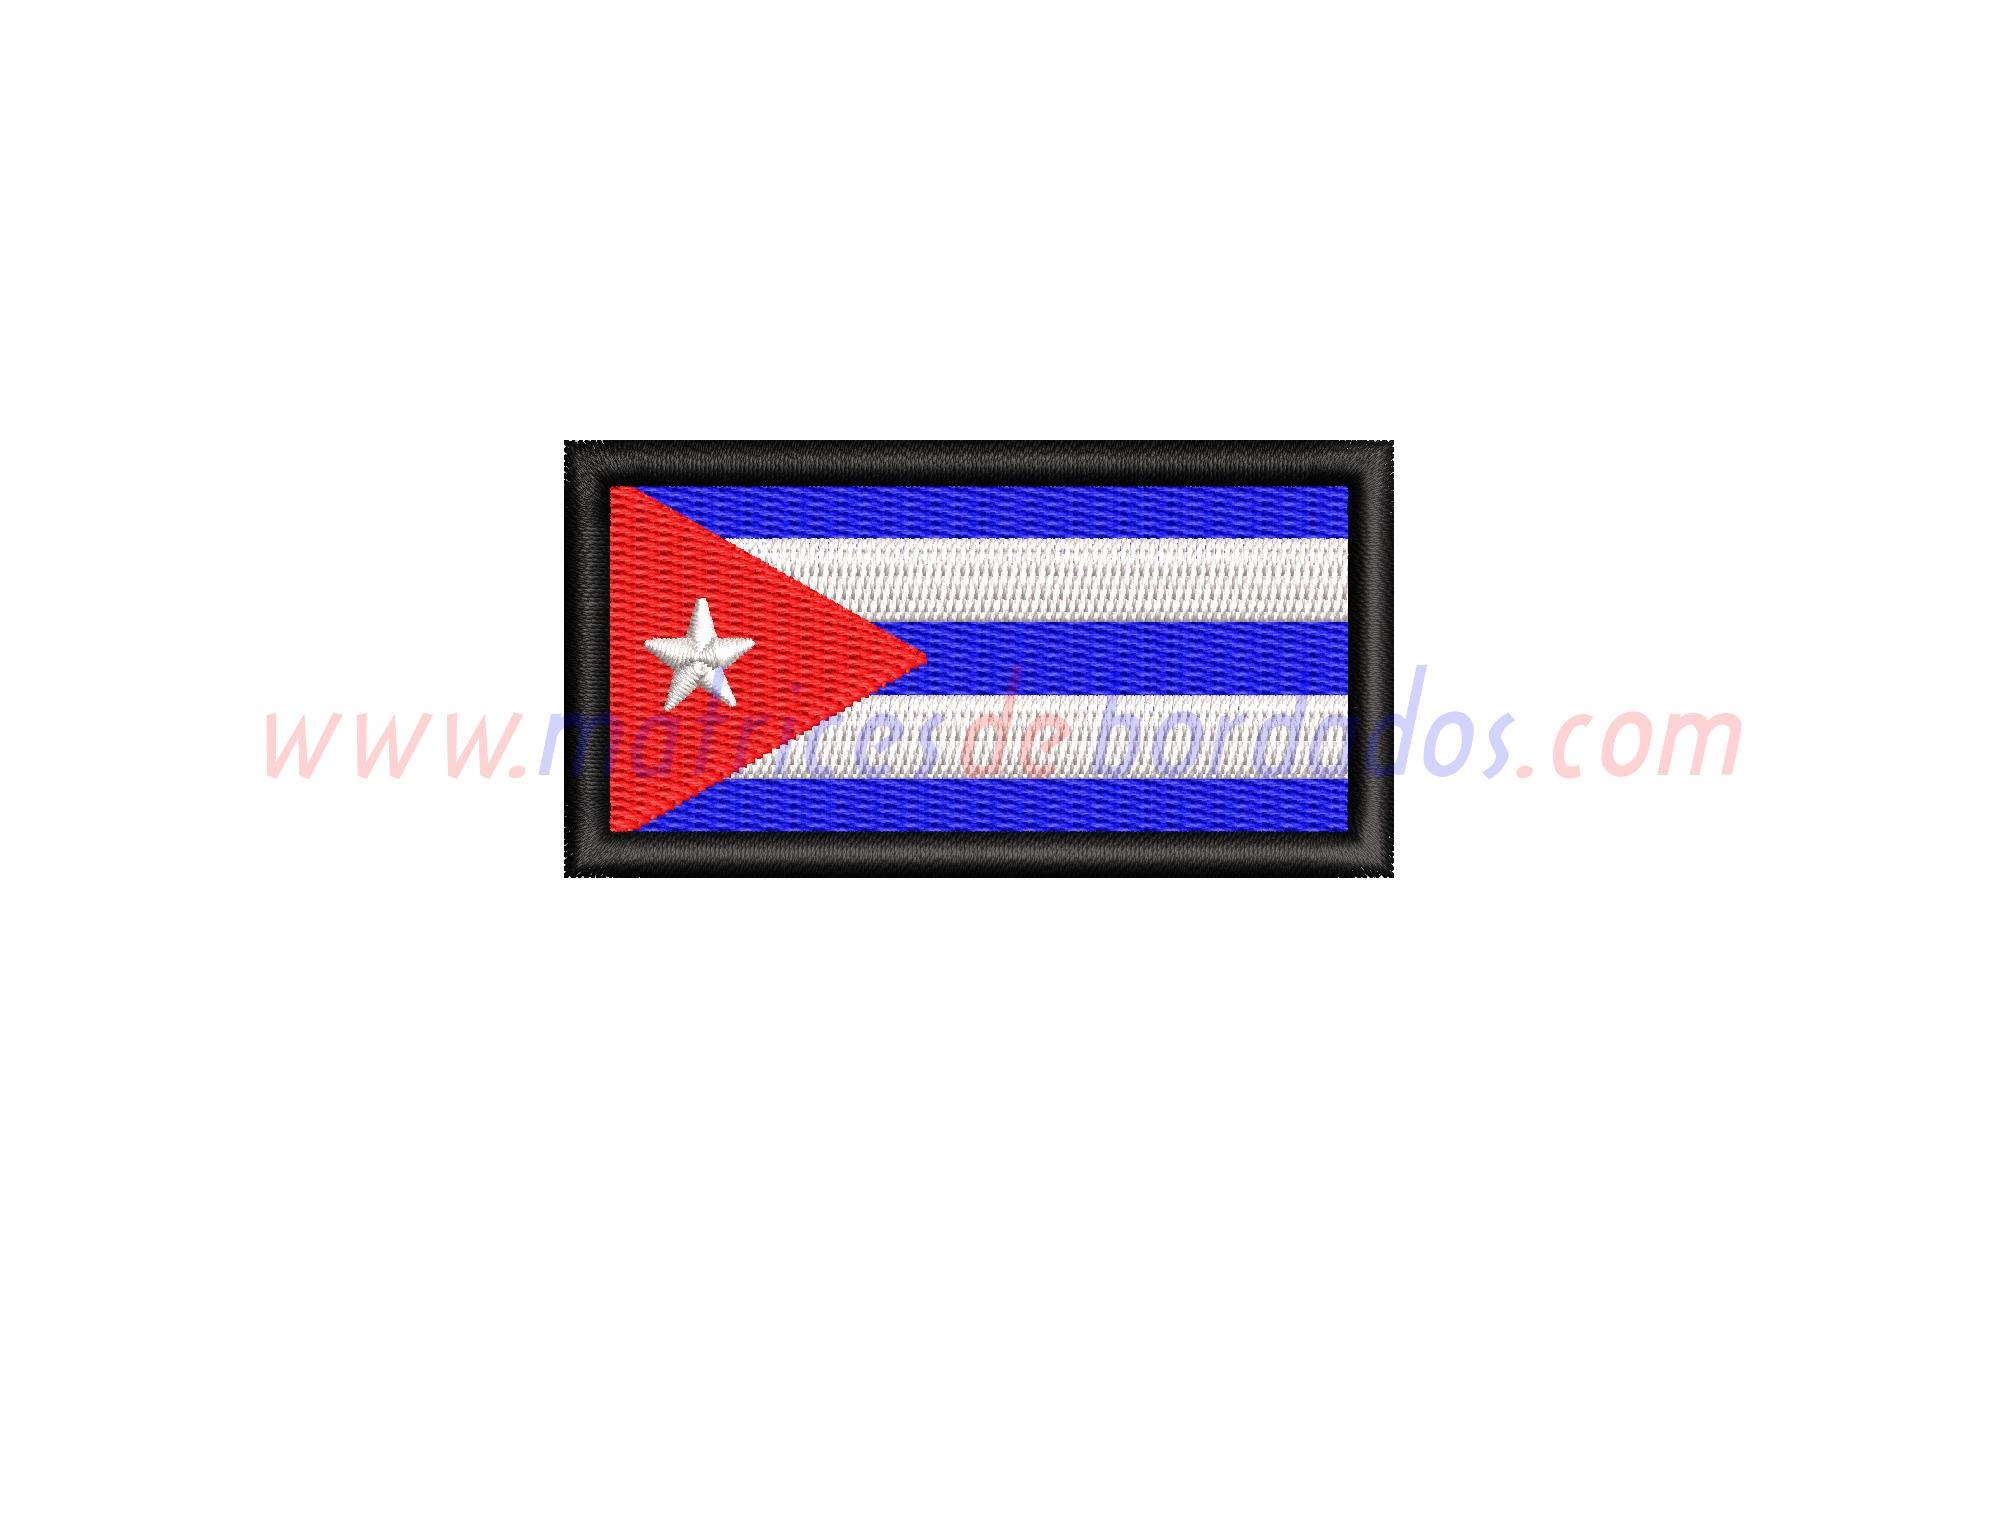 DY56CX - Bandera Cubana